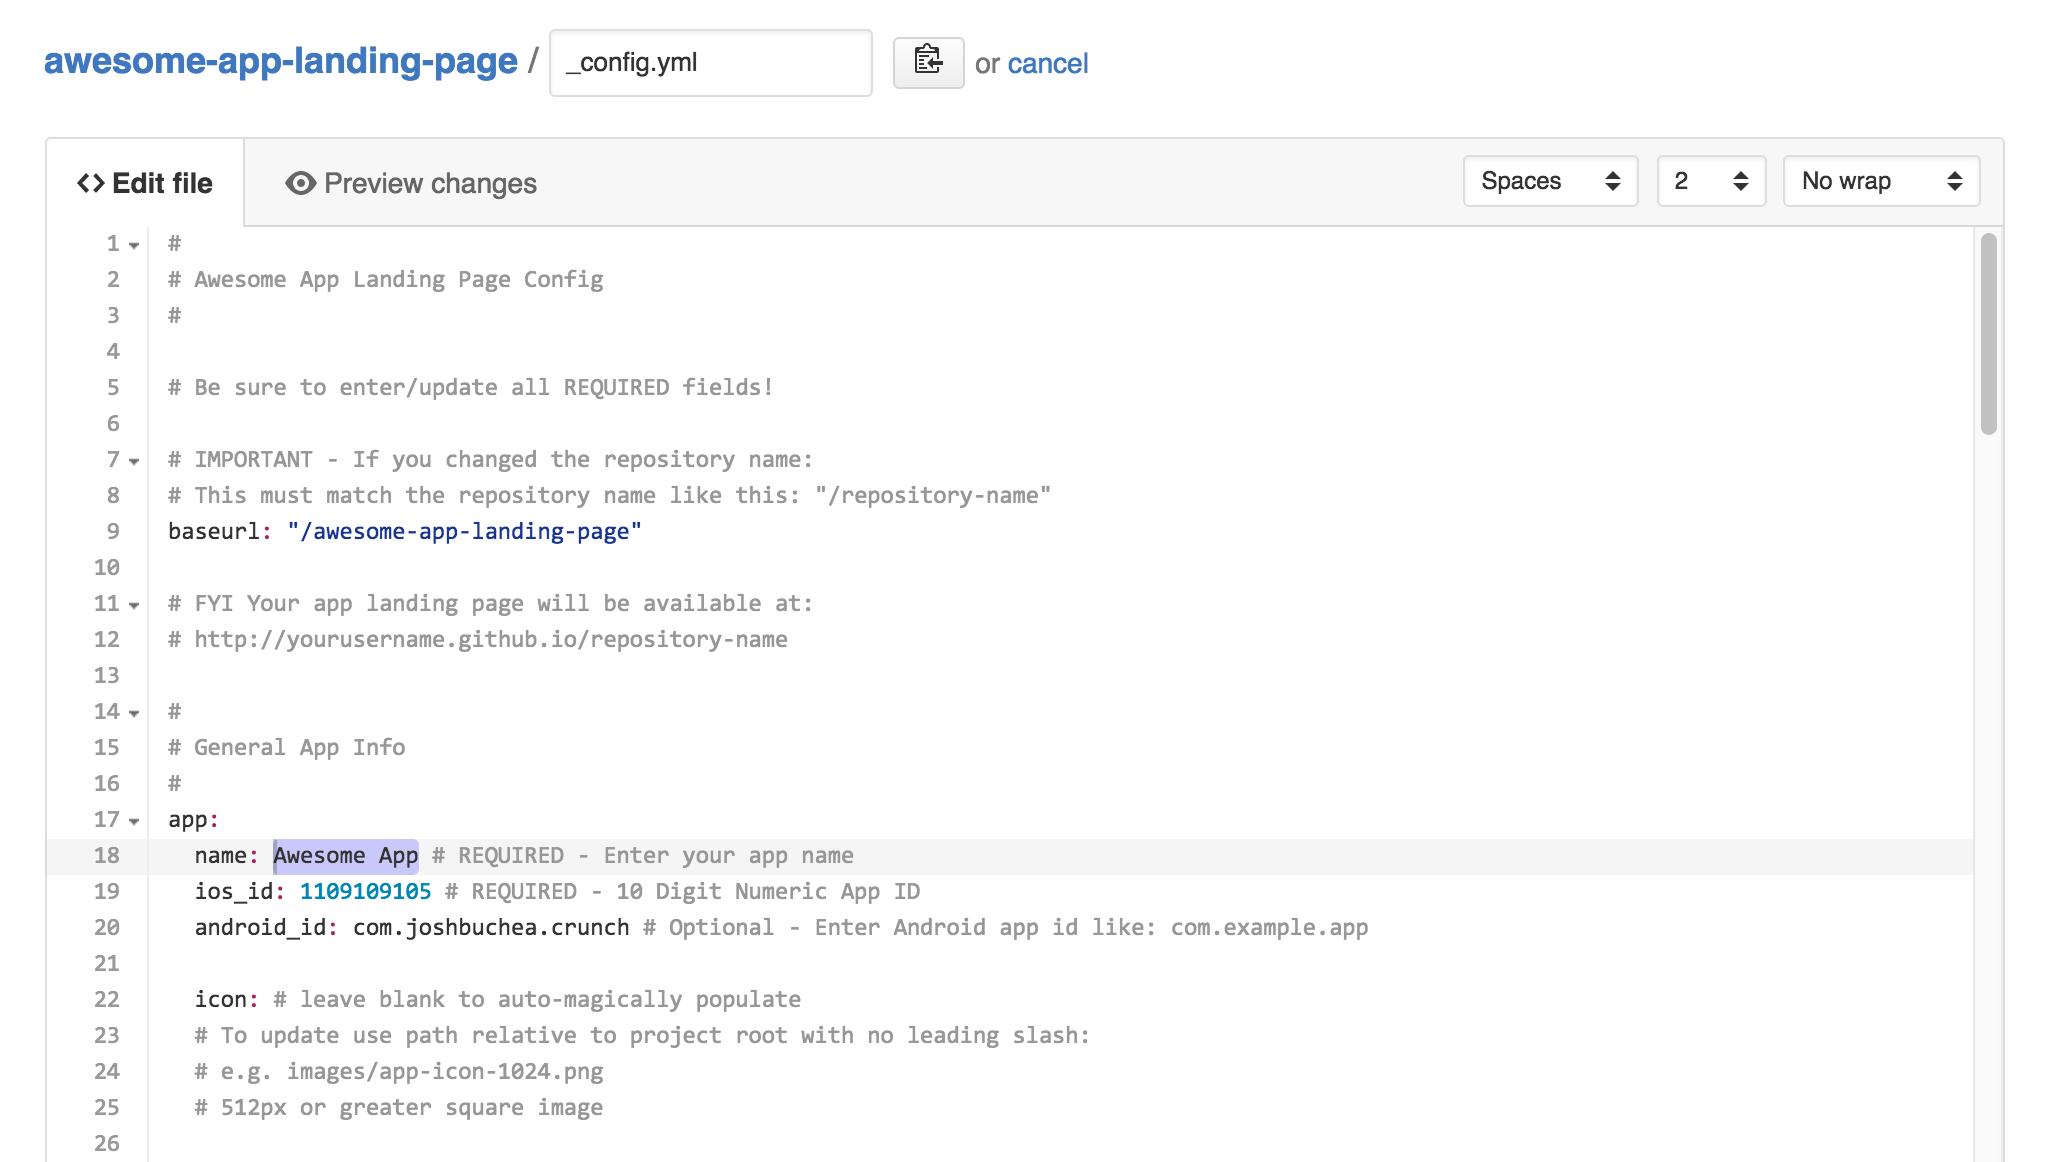 Awesome App Landing Page - 很棒的应用程序登录页